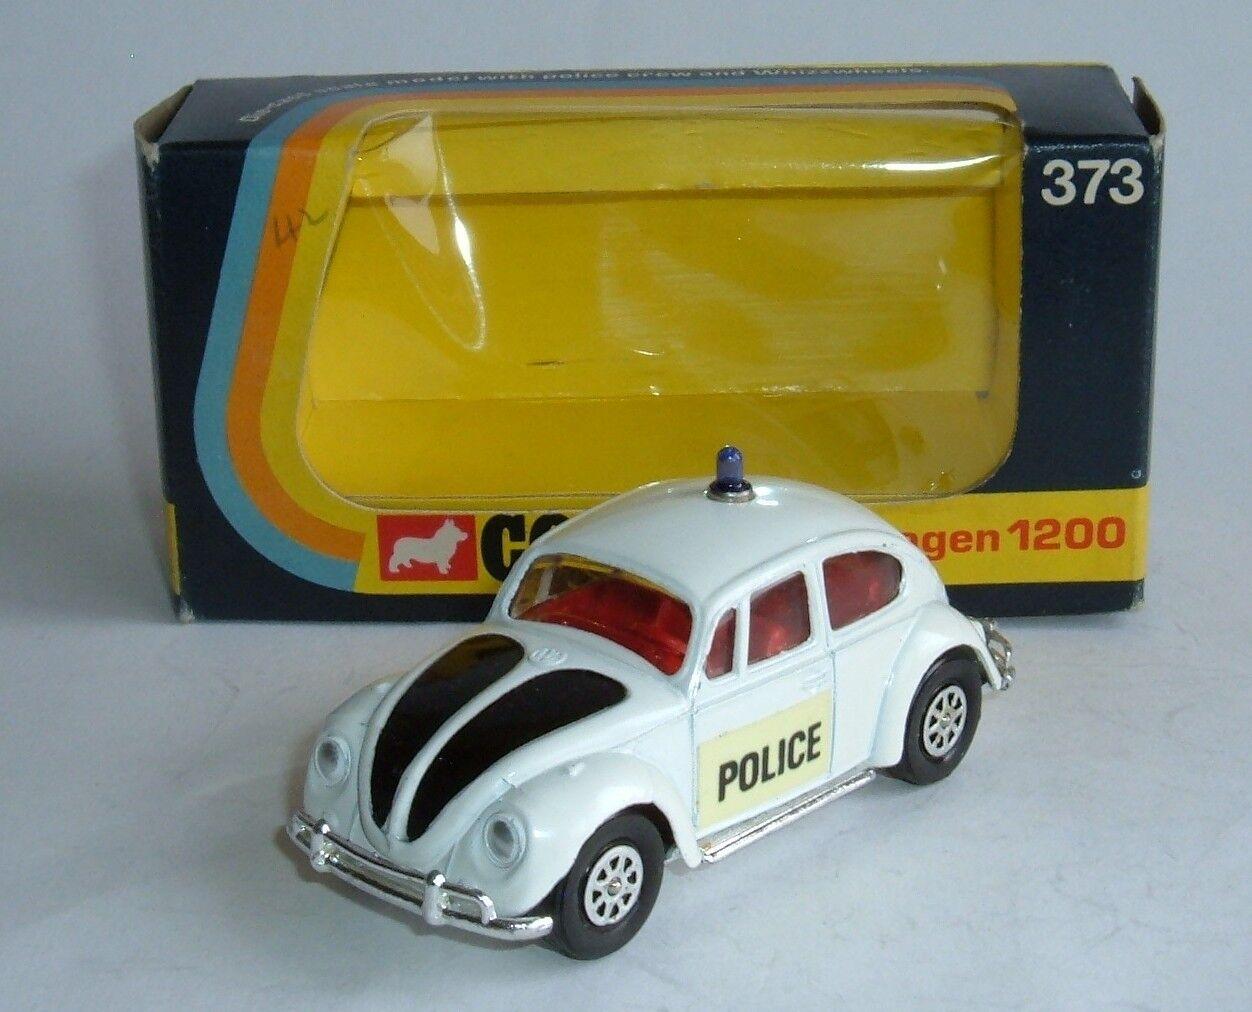 CORGI TOYS no 373, VOLKSWAGEN 1200 voiture de police, - SUPERBE int.